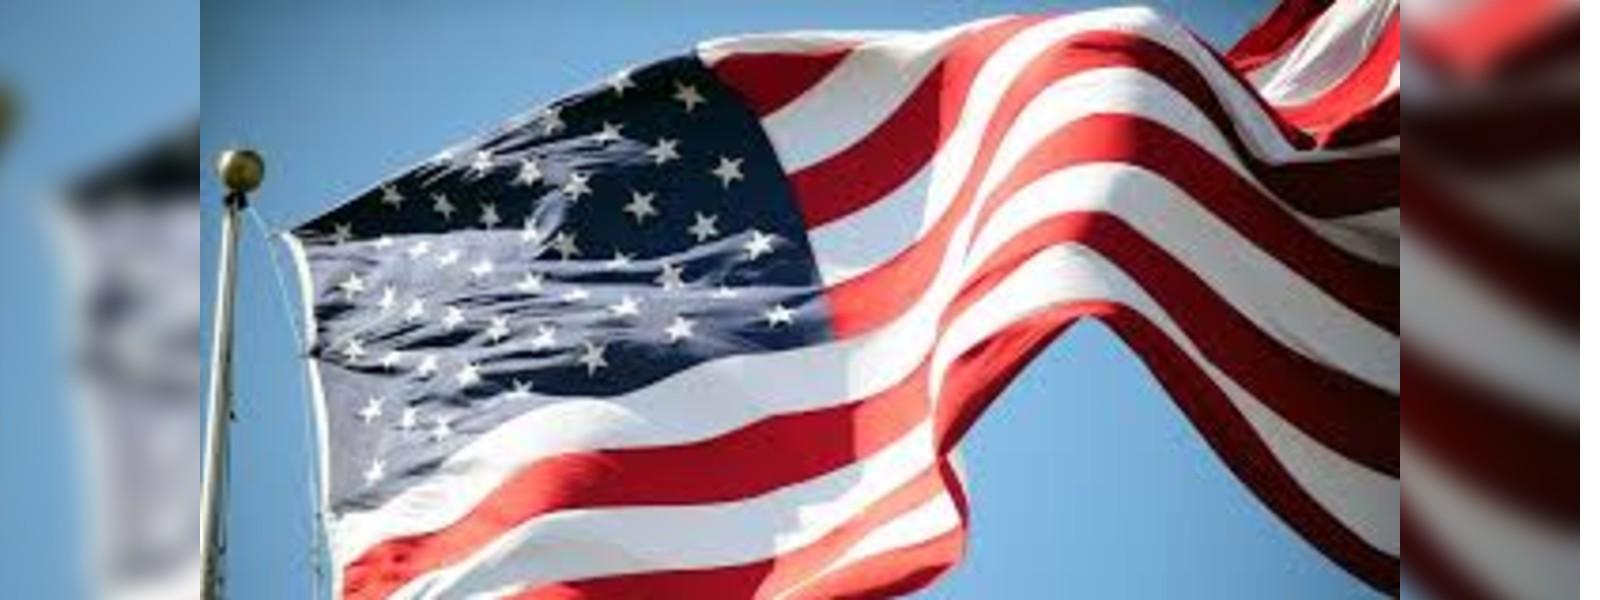 U.S. delegates inspected the Hambantota International Port today.